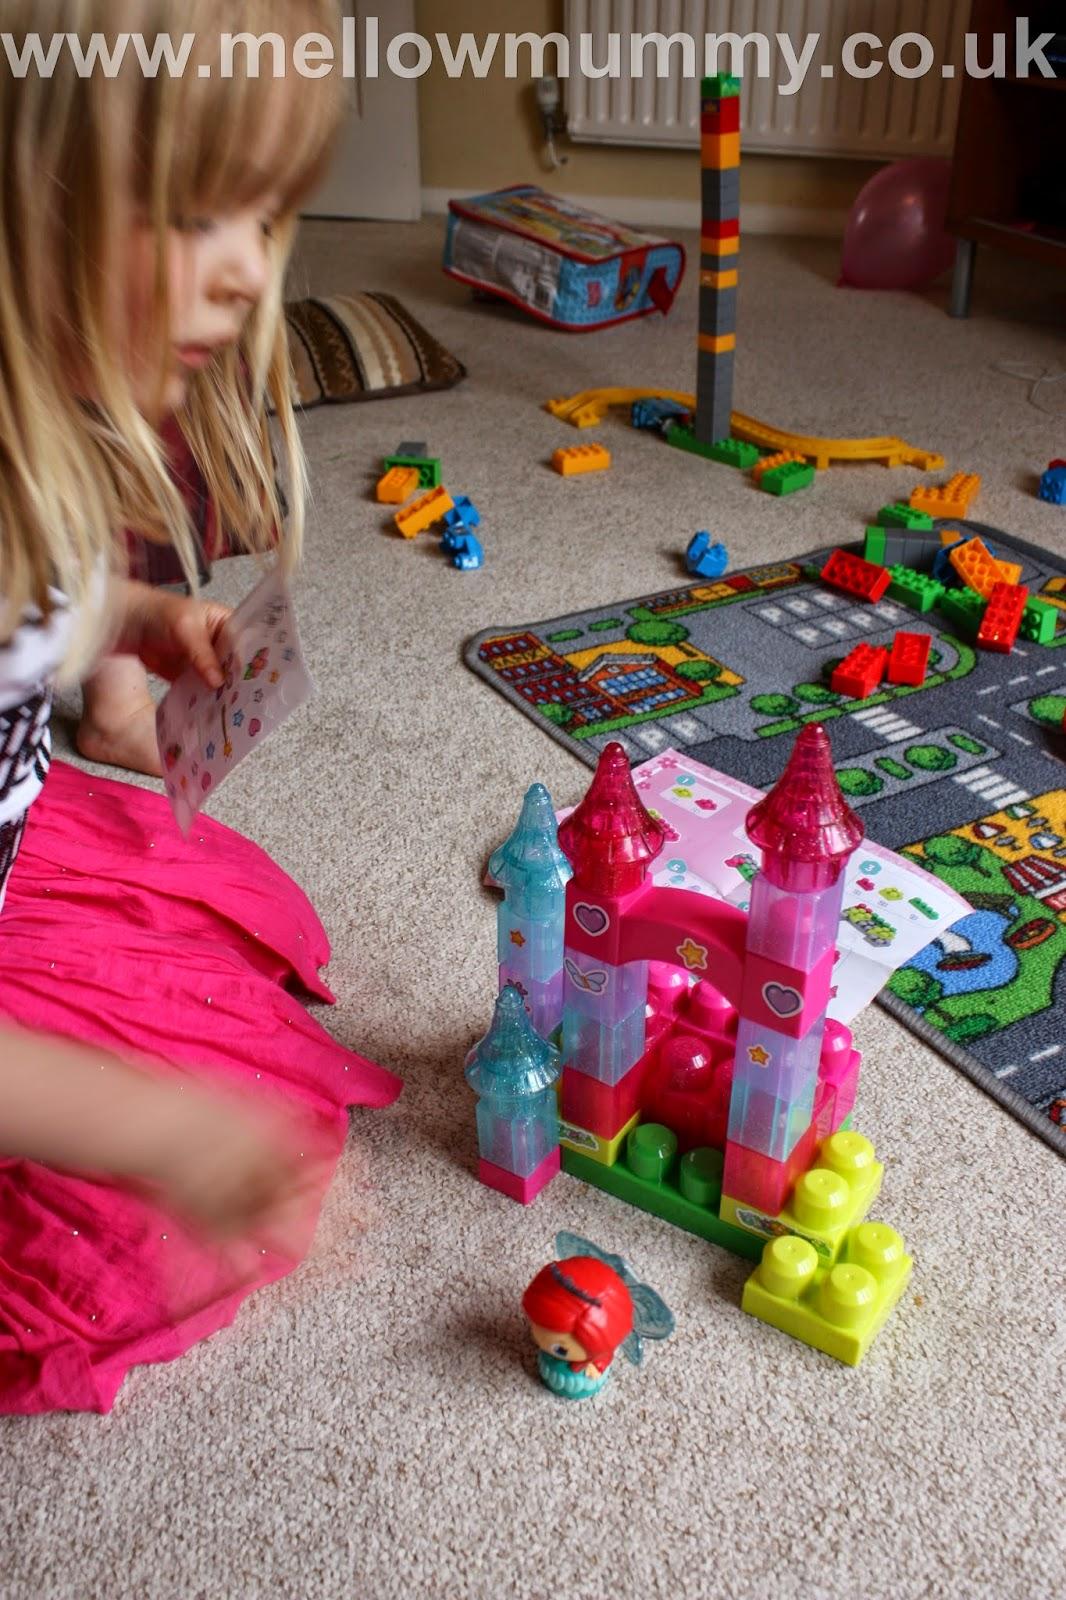 Mellow Mummy: Thomas & Friends By Mega Bloks : Taking life as it